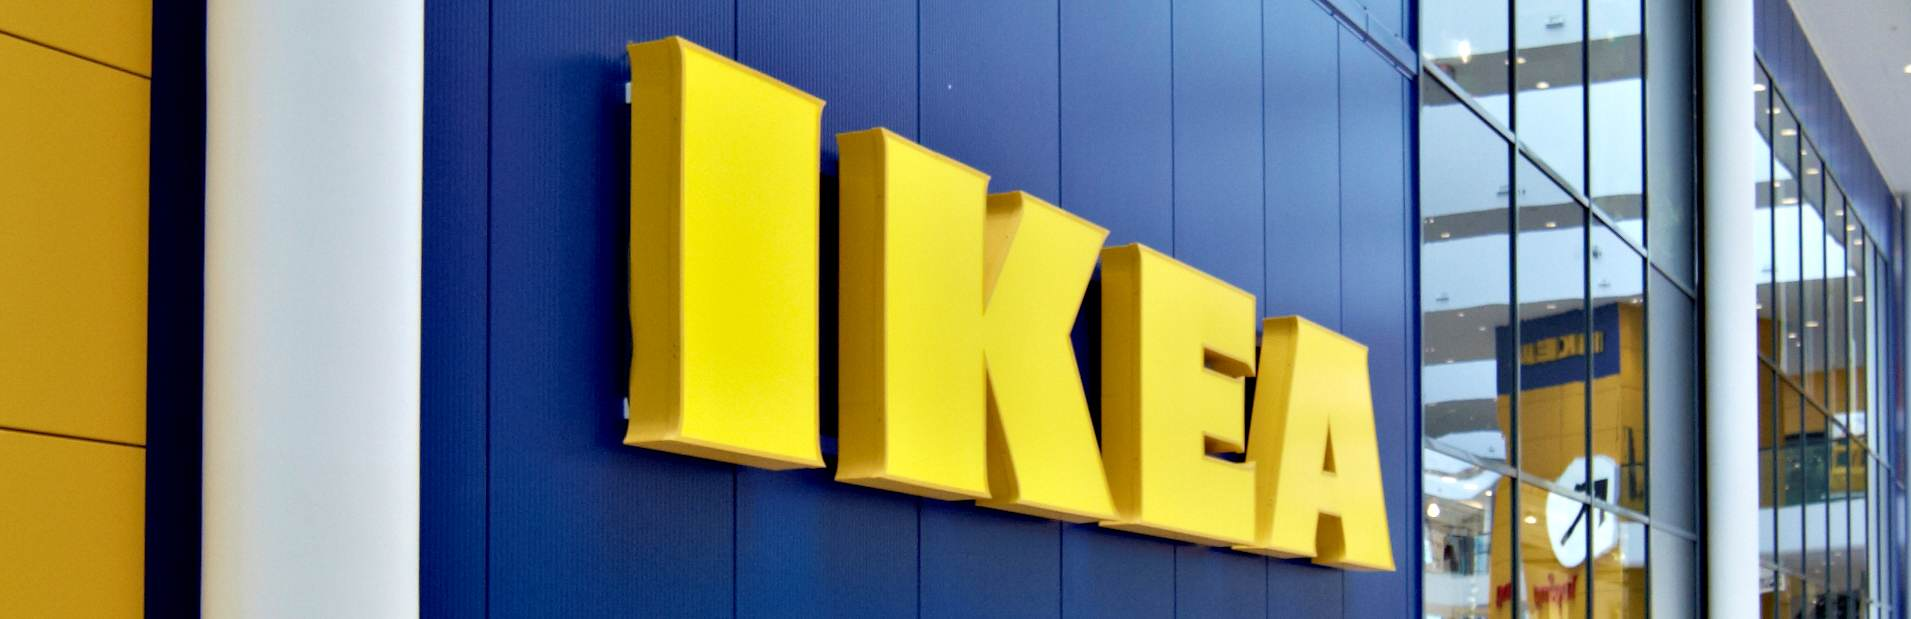 IKEA'dan Beş Harika Facebook Kampanyası